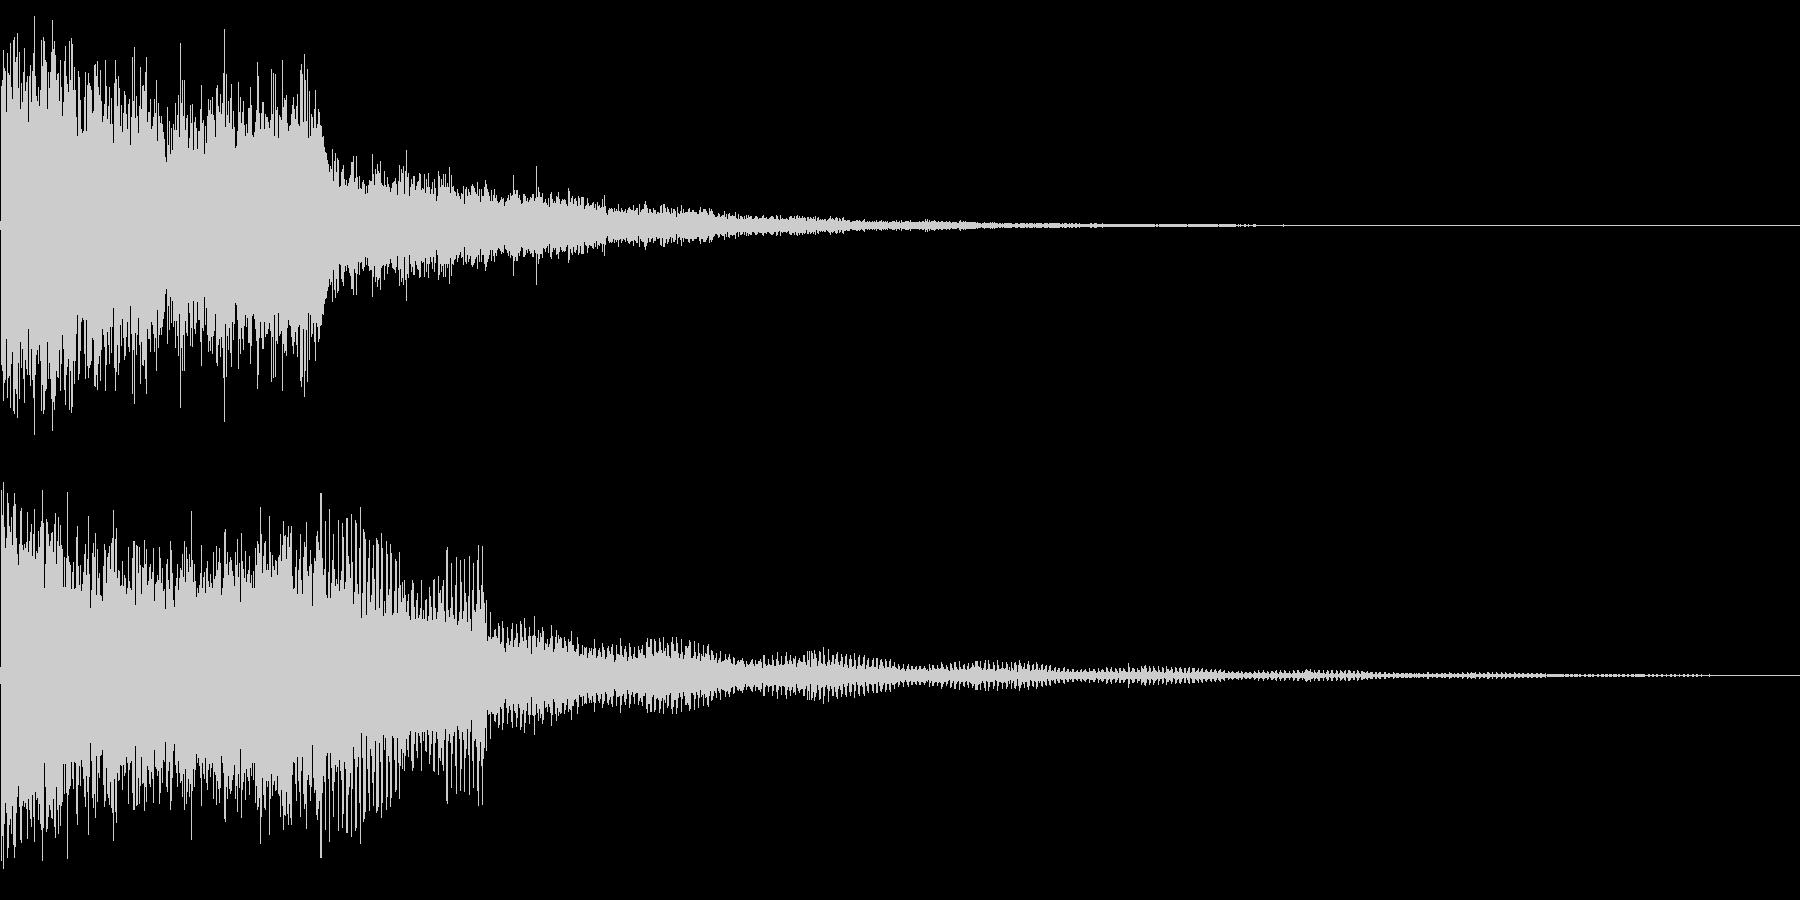 245 FX爆発音(3)の未再生の波形